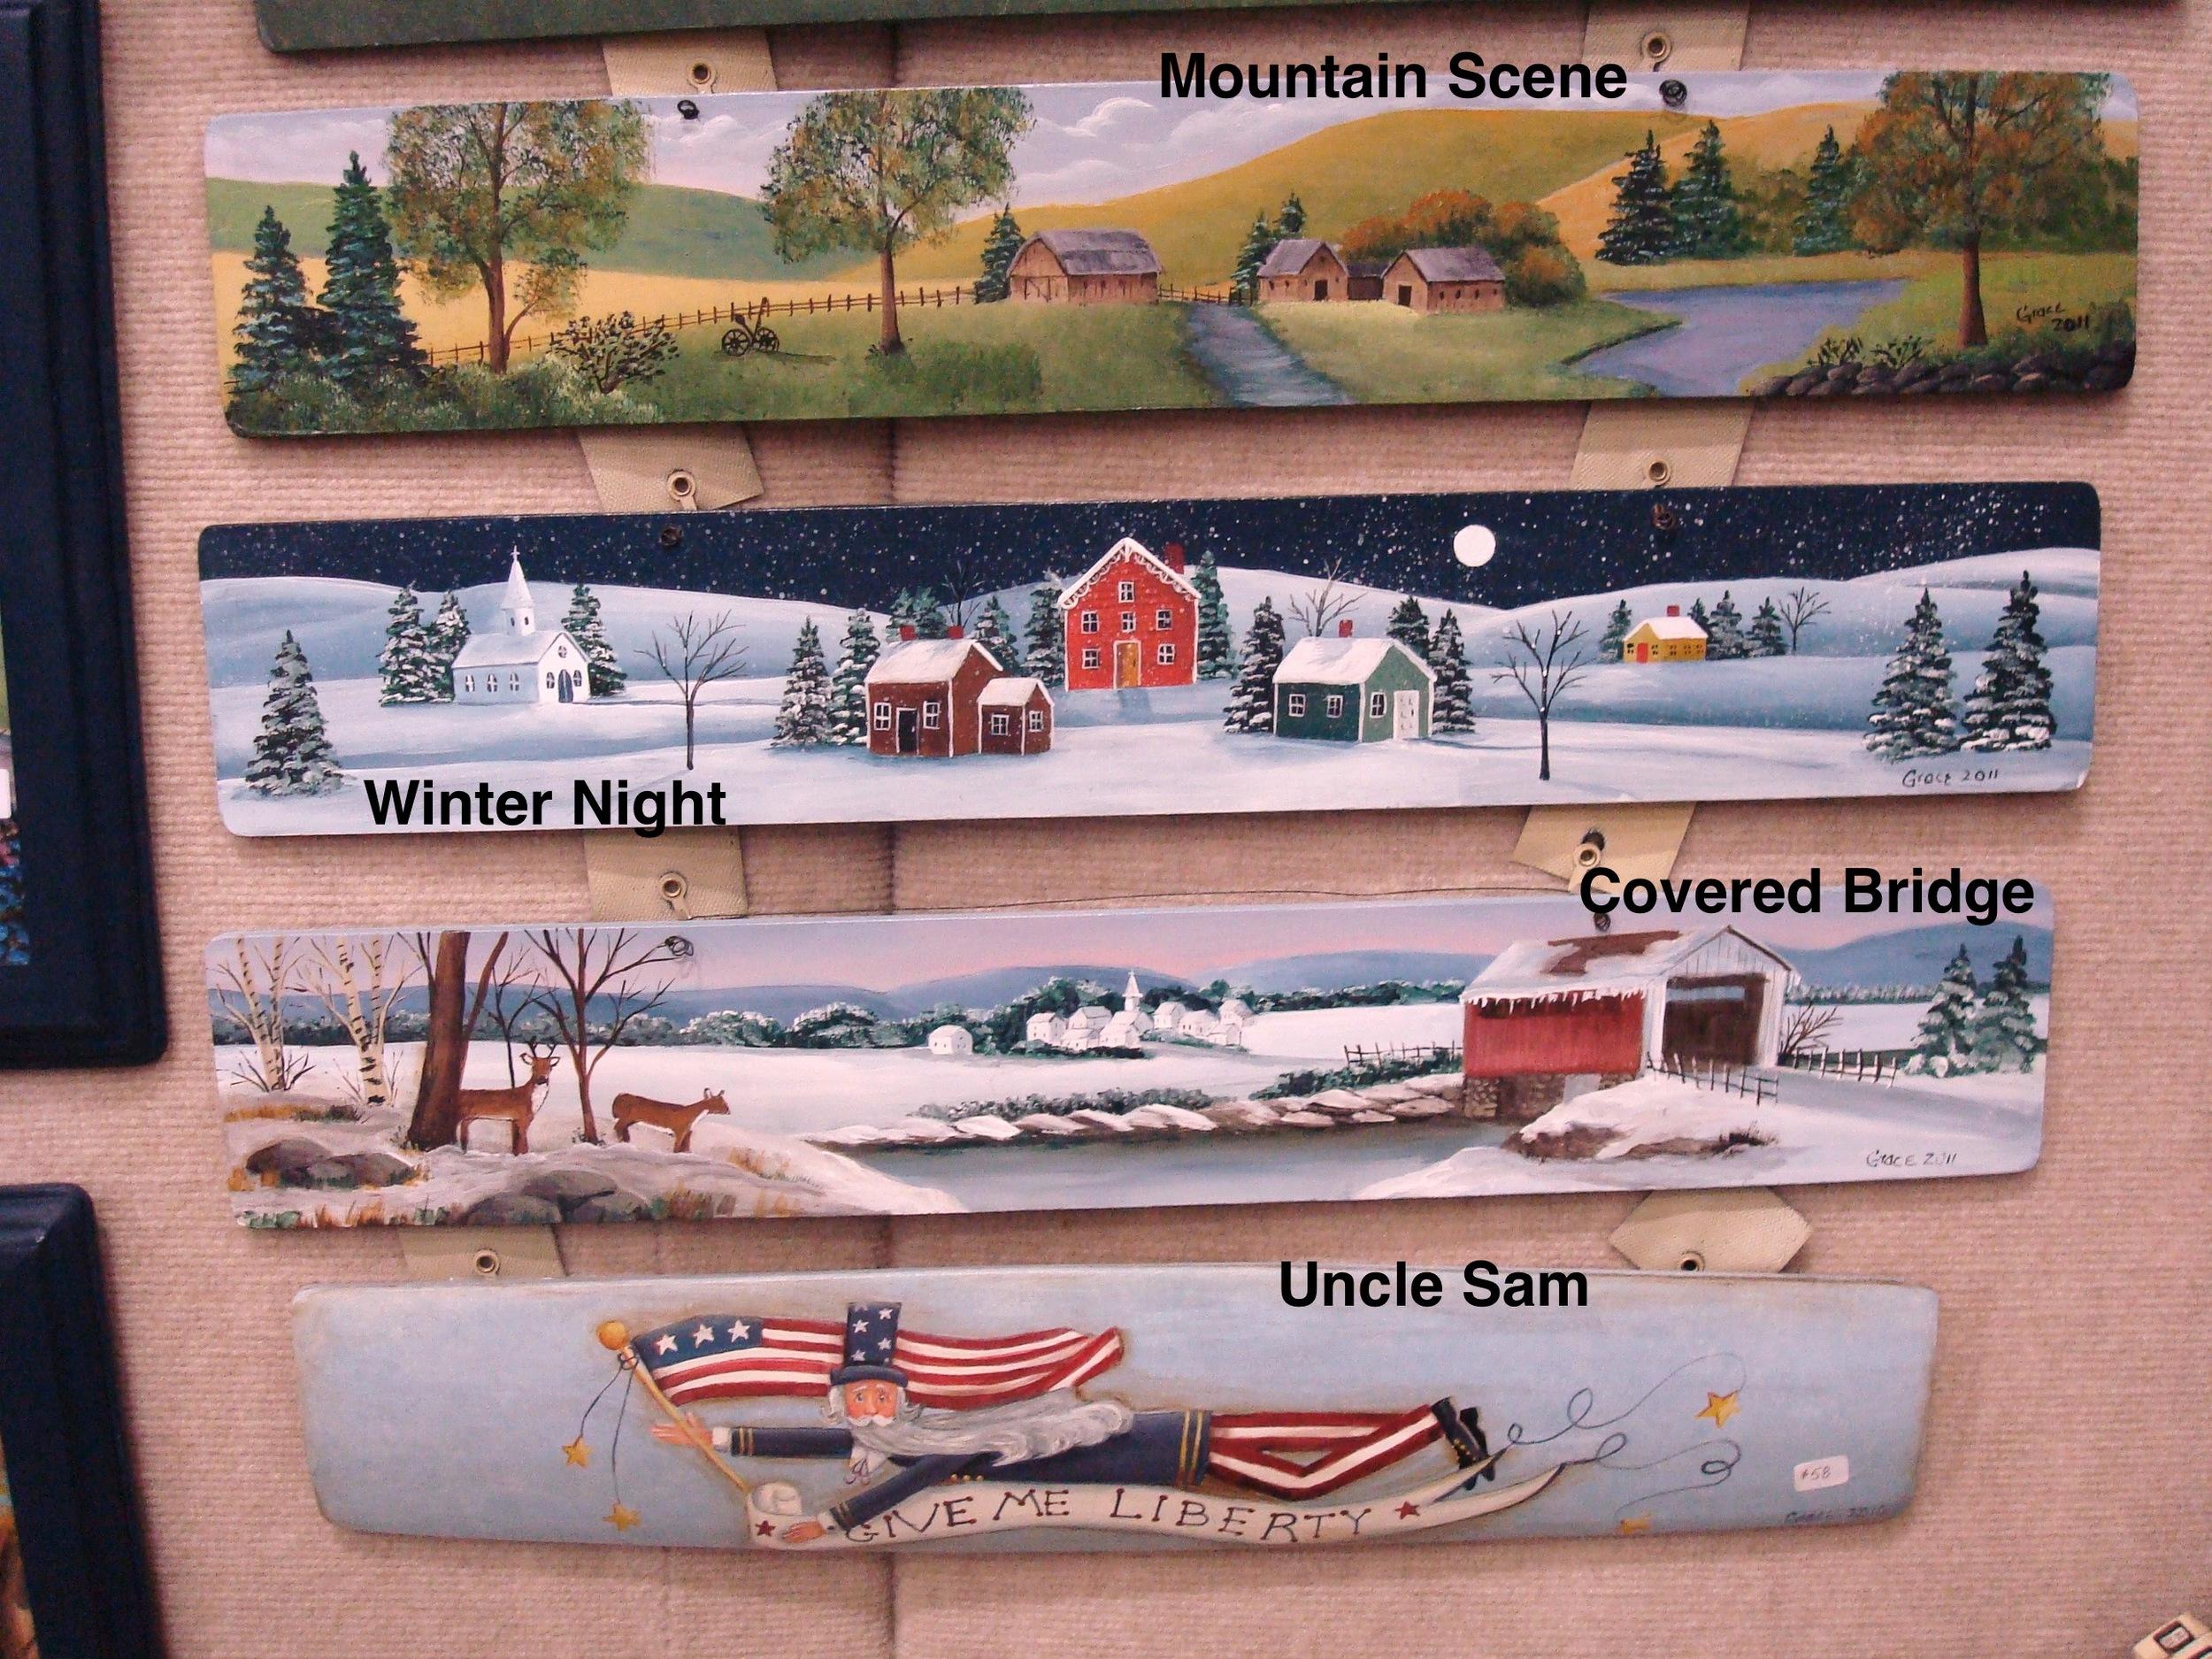 Mountain Scene / Winter Night / Covered Bridge / Uncle Sam